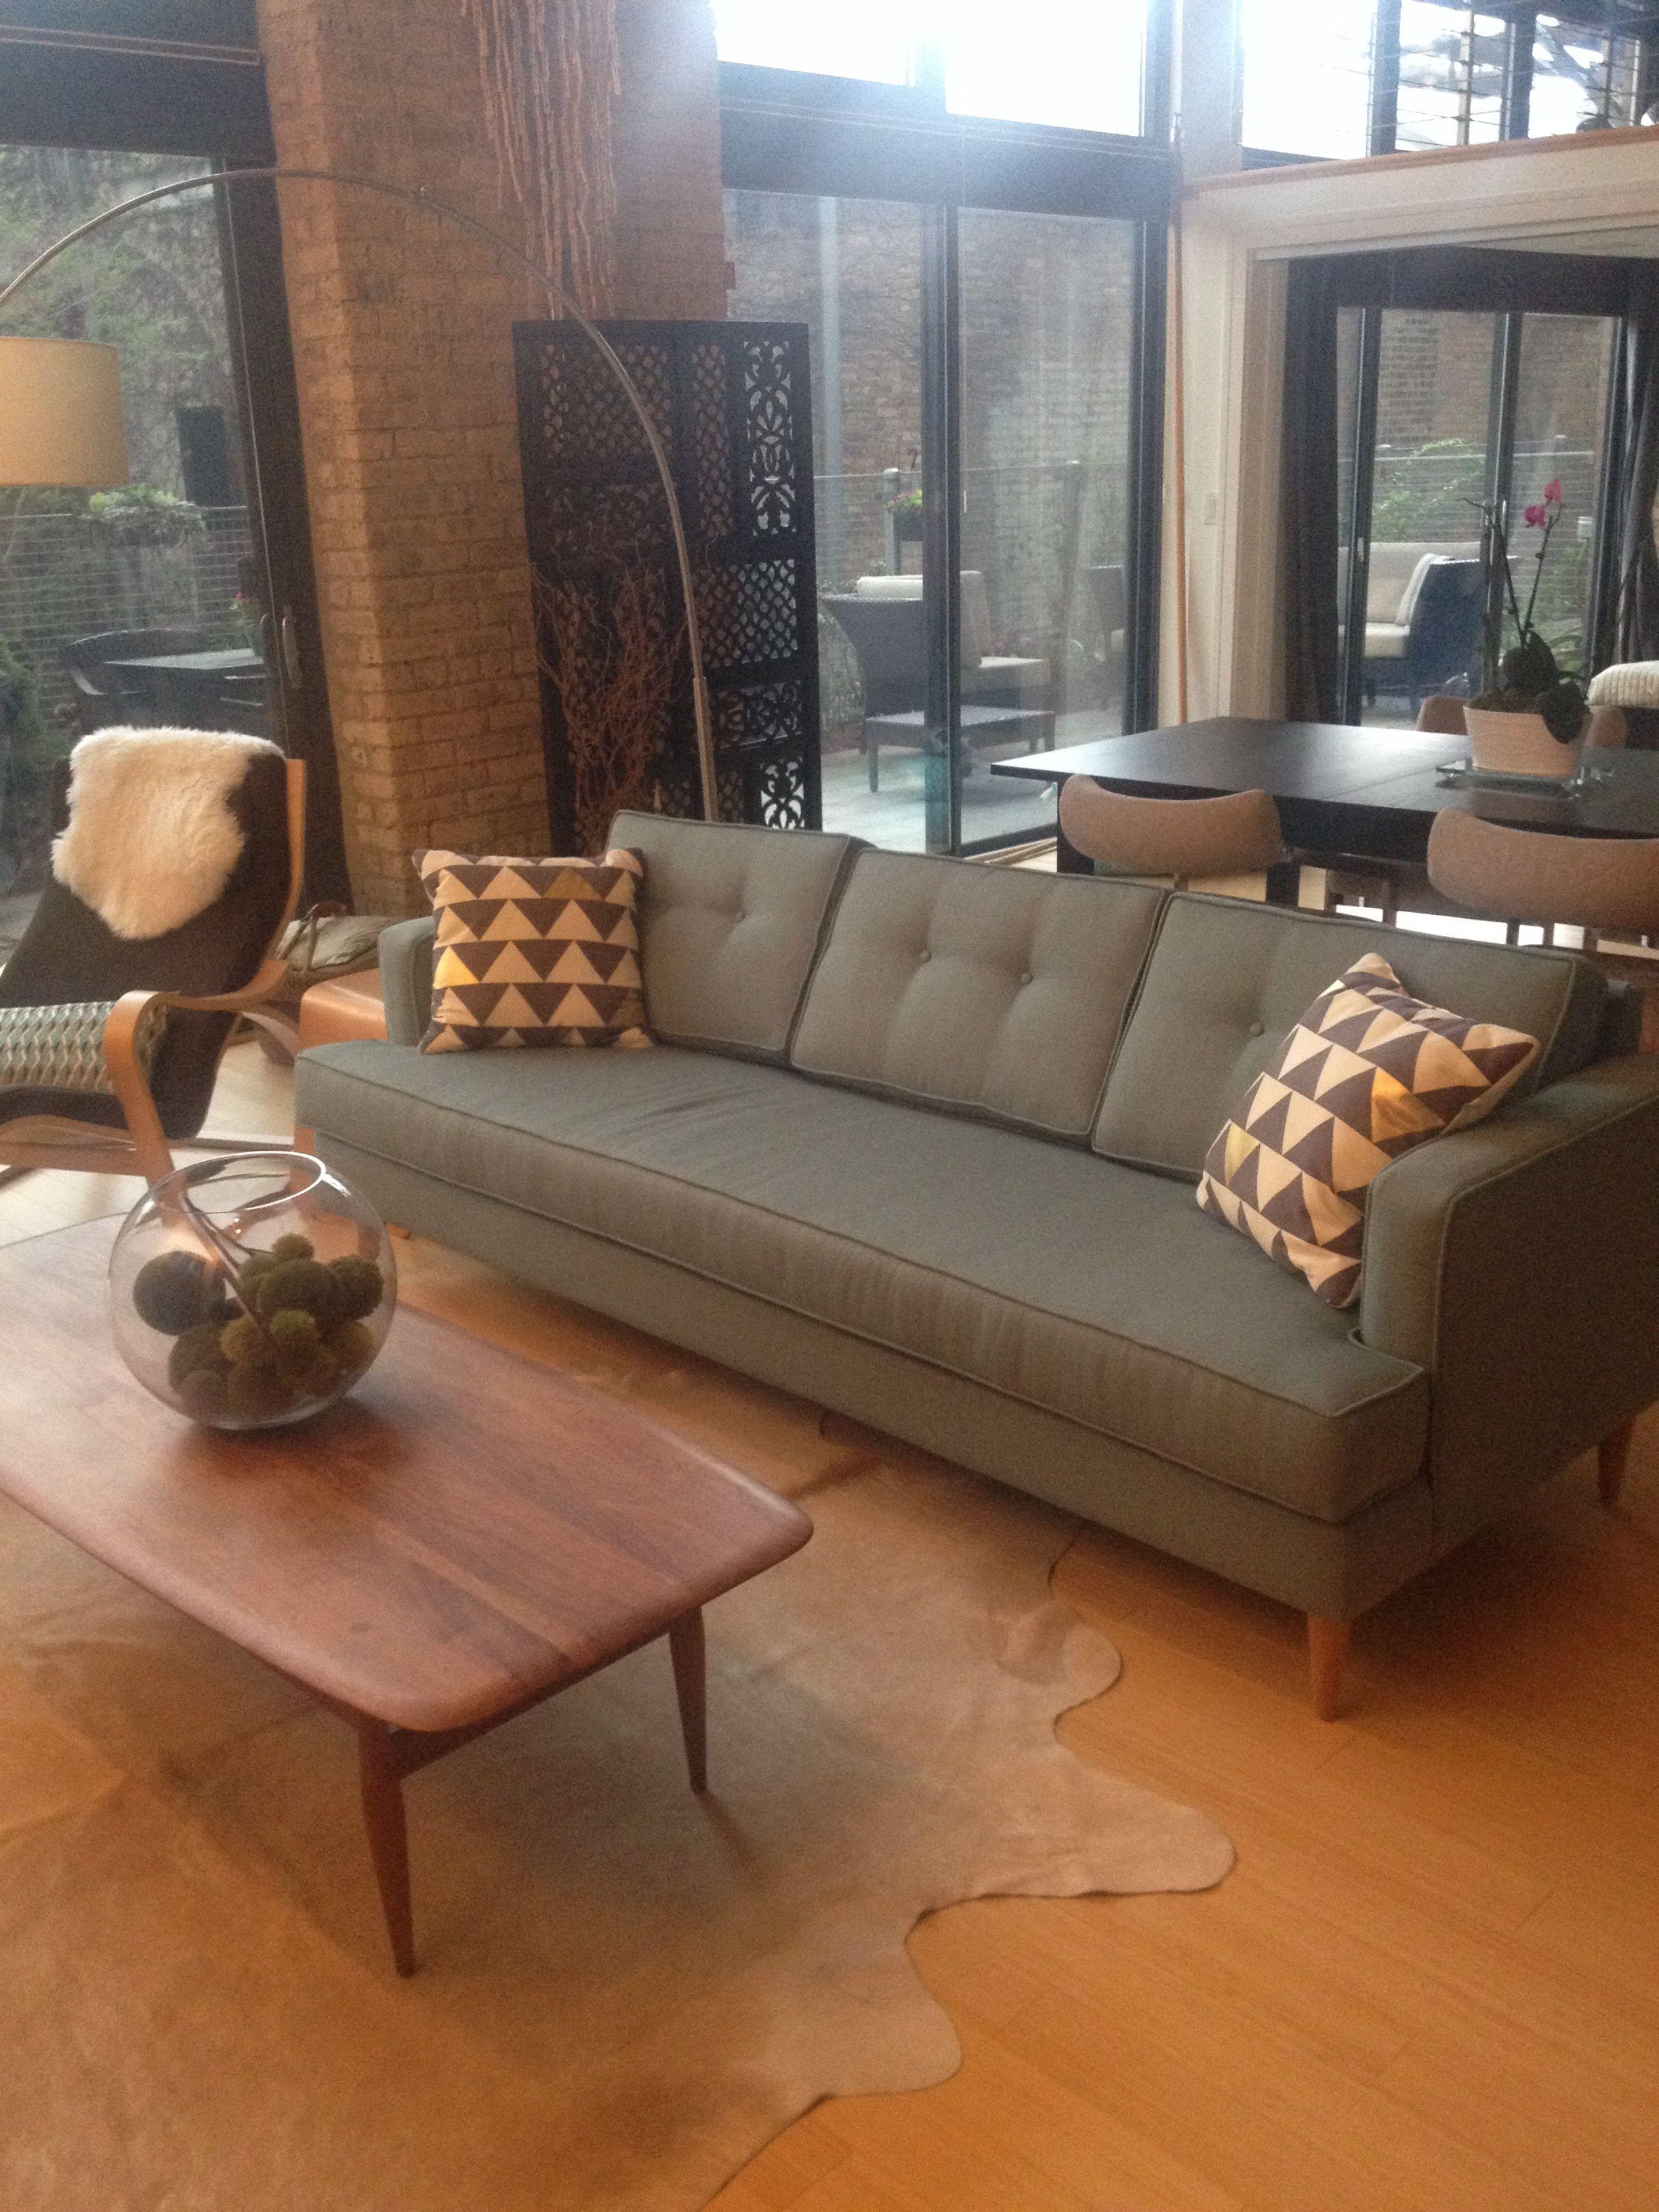 Mid Century Sofa From Funkysofa.com. Love The Aqua Color!